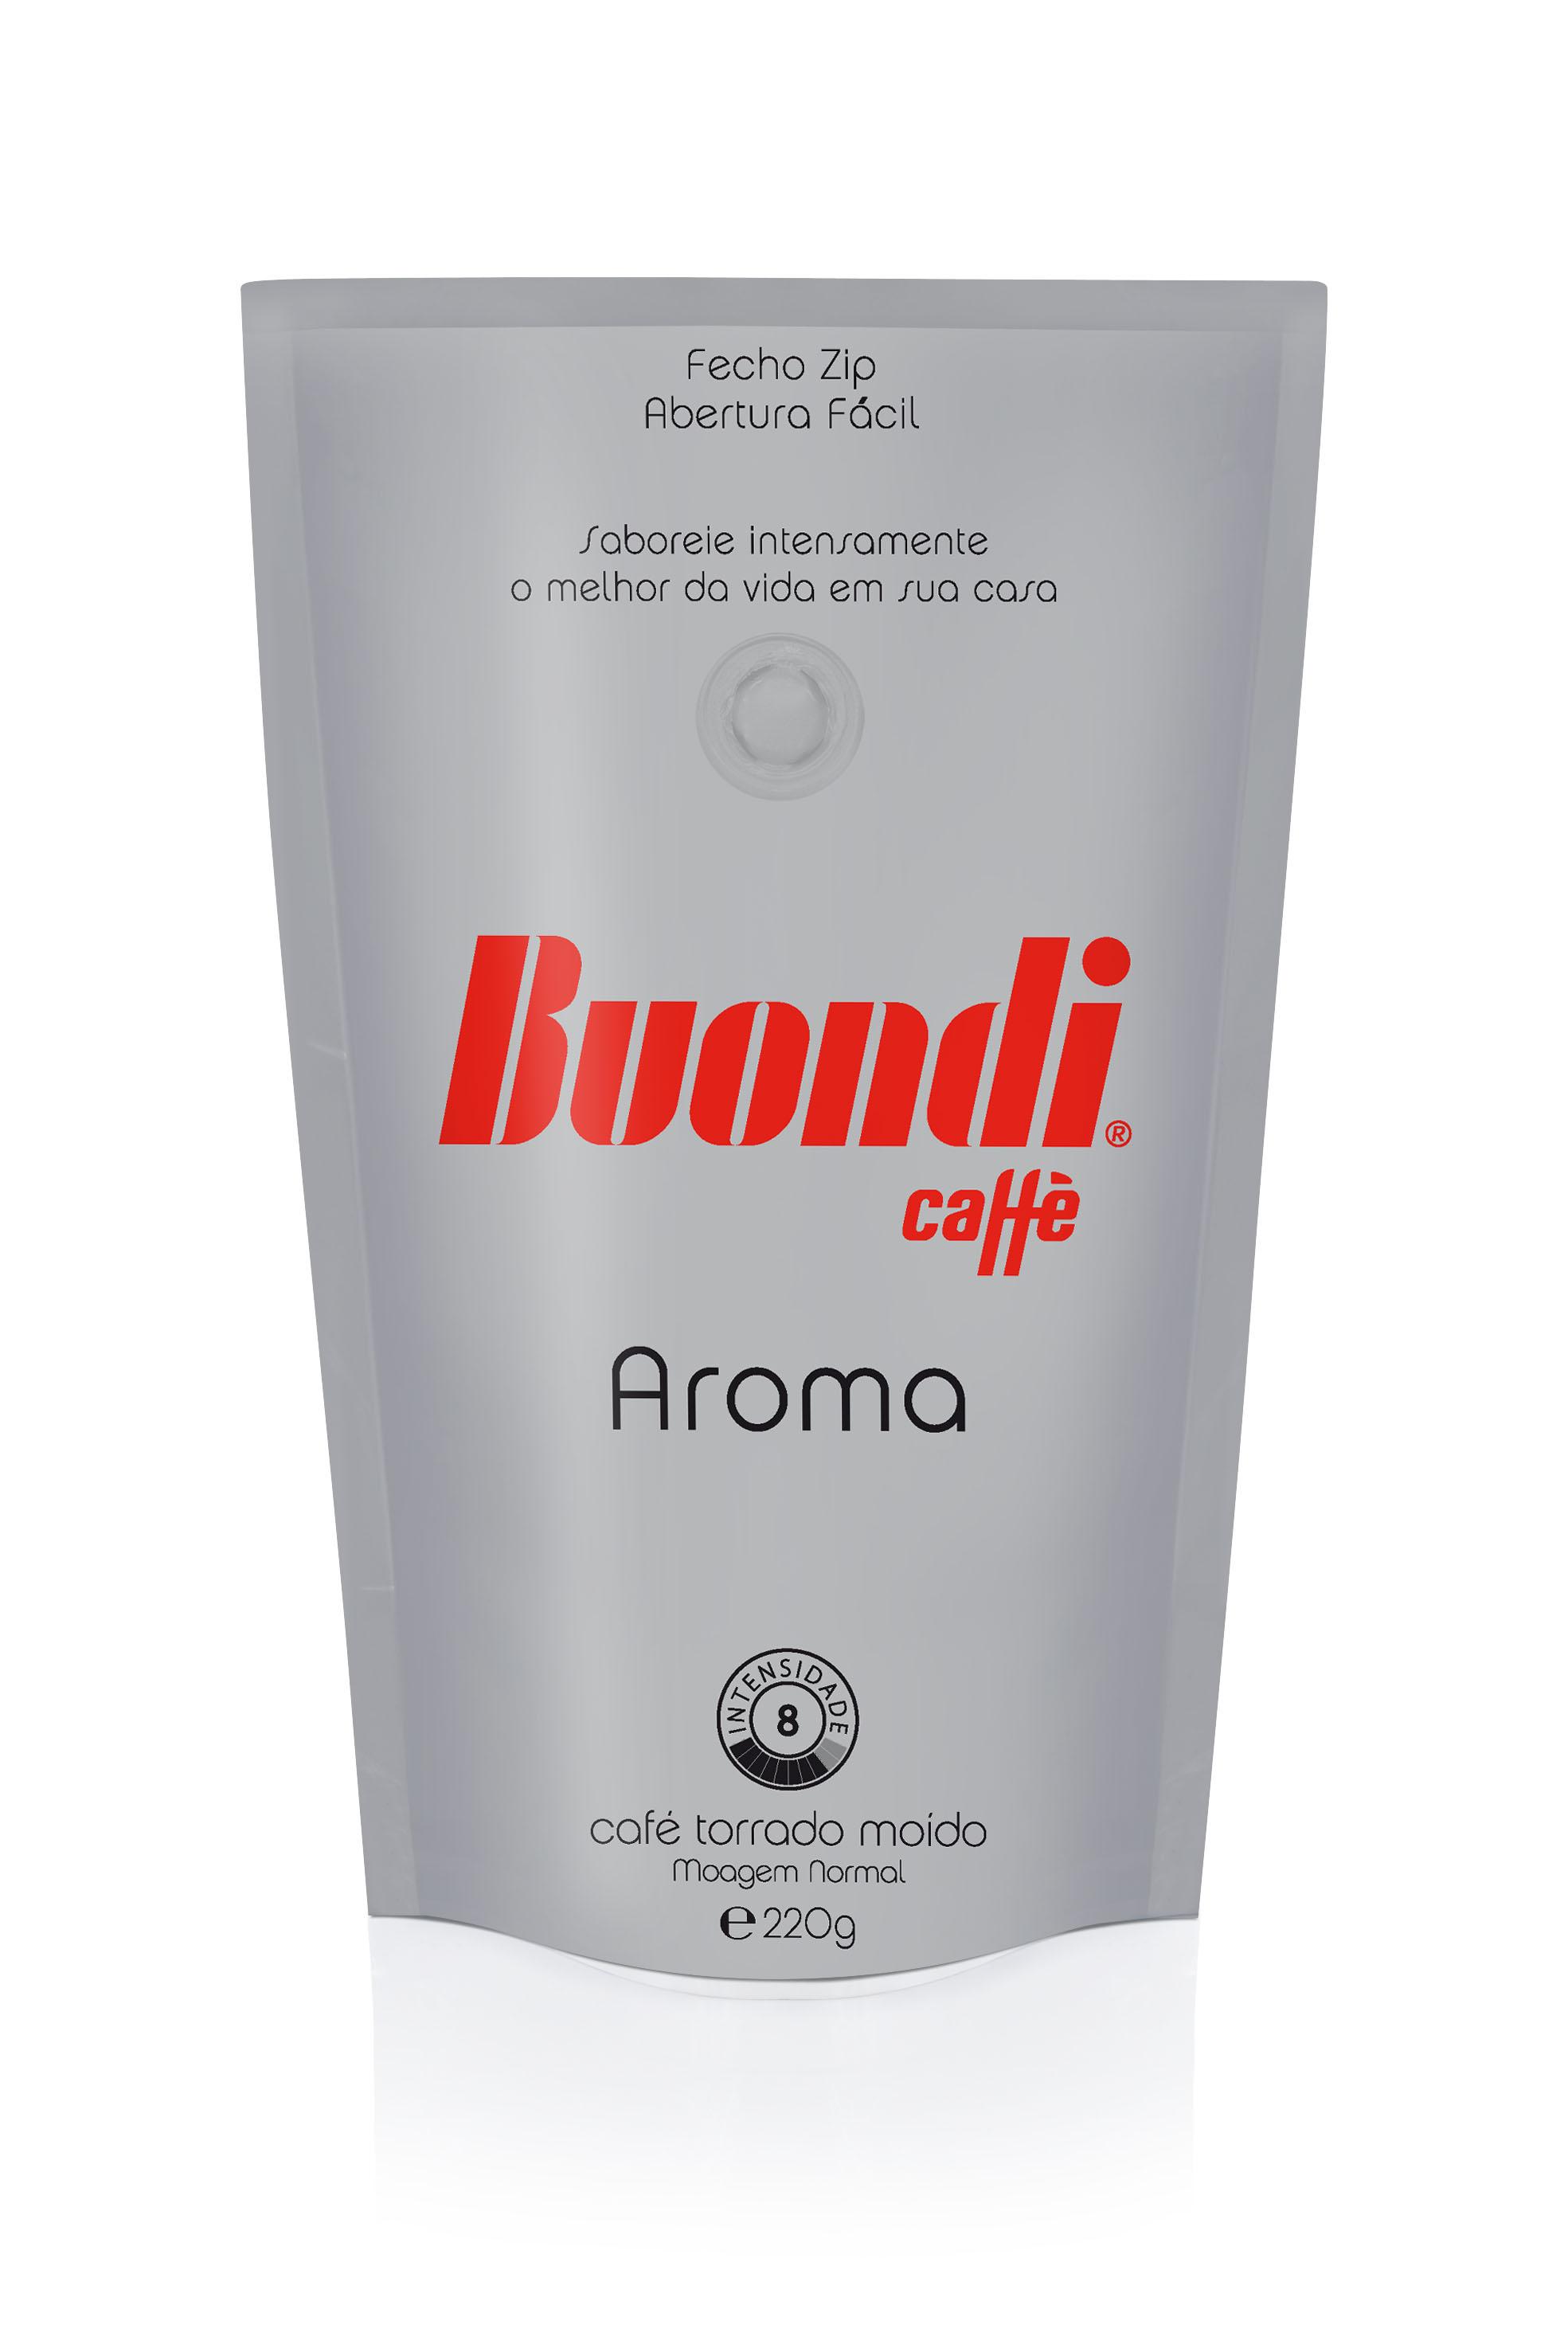 3D_Aroma Buondi 220g